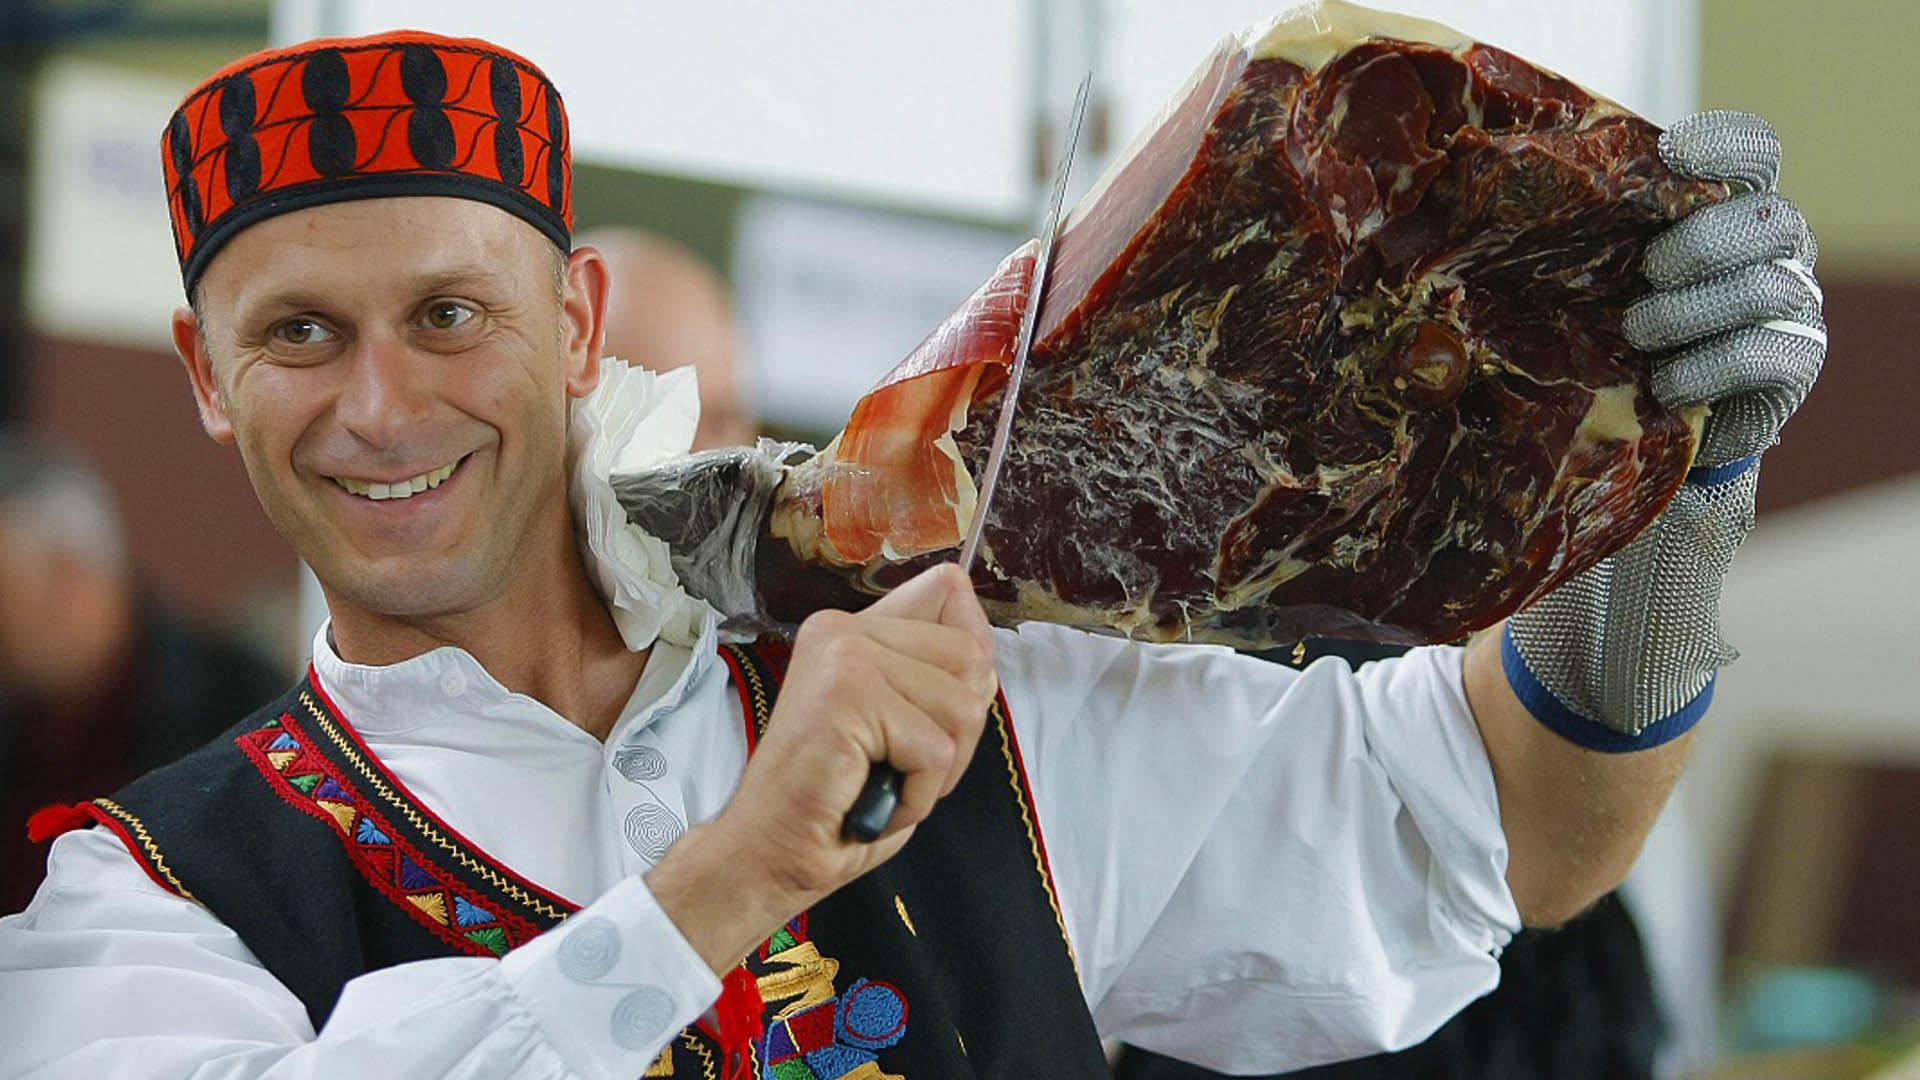 festival pršuta u Drnišu